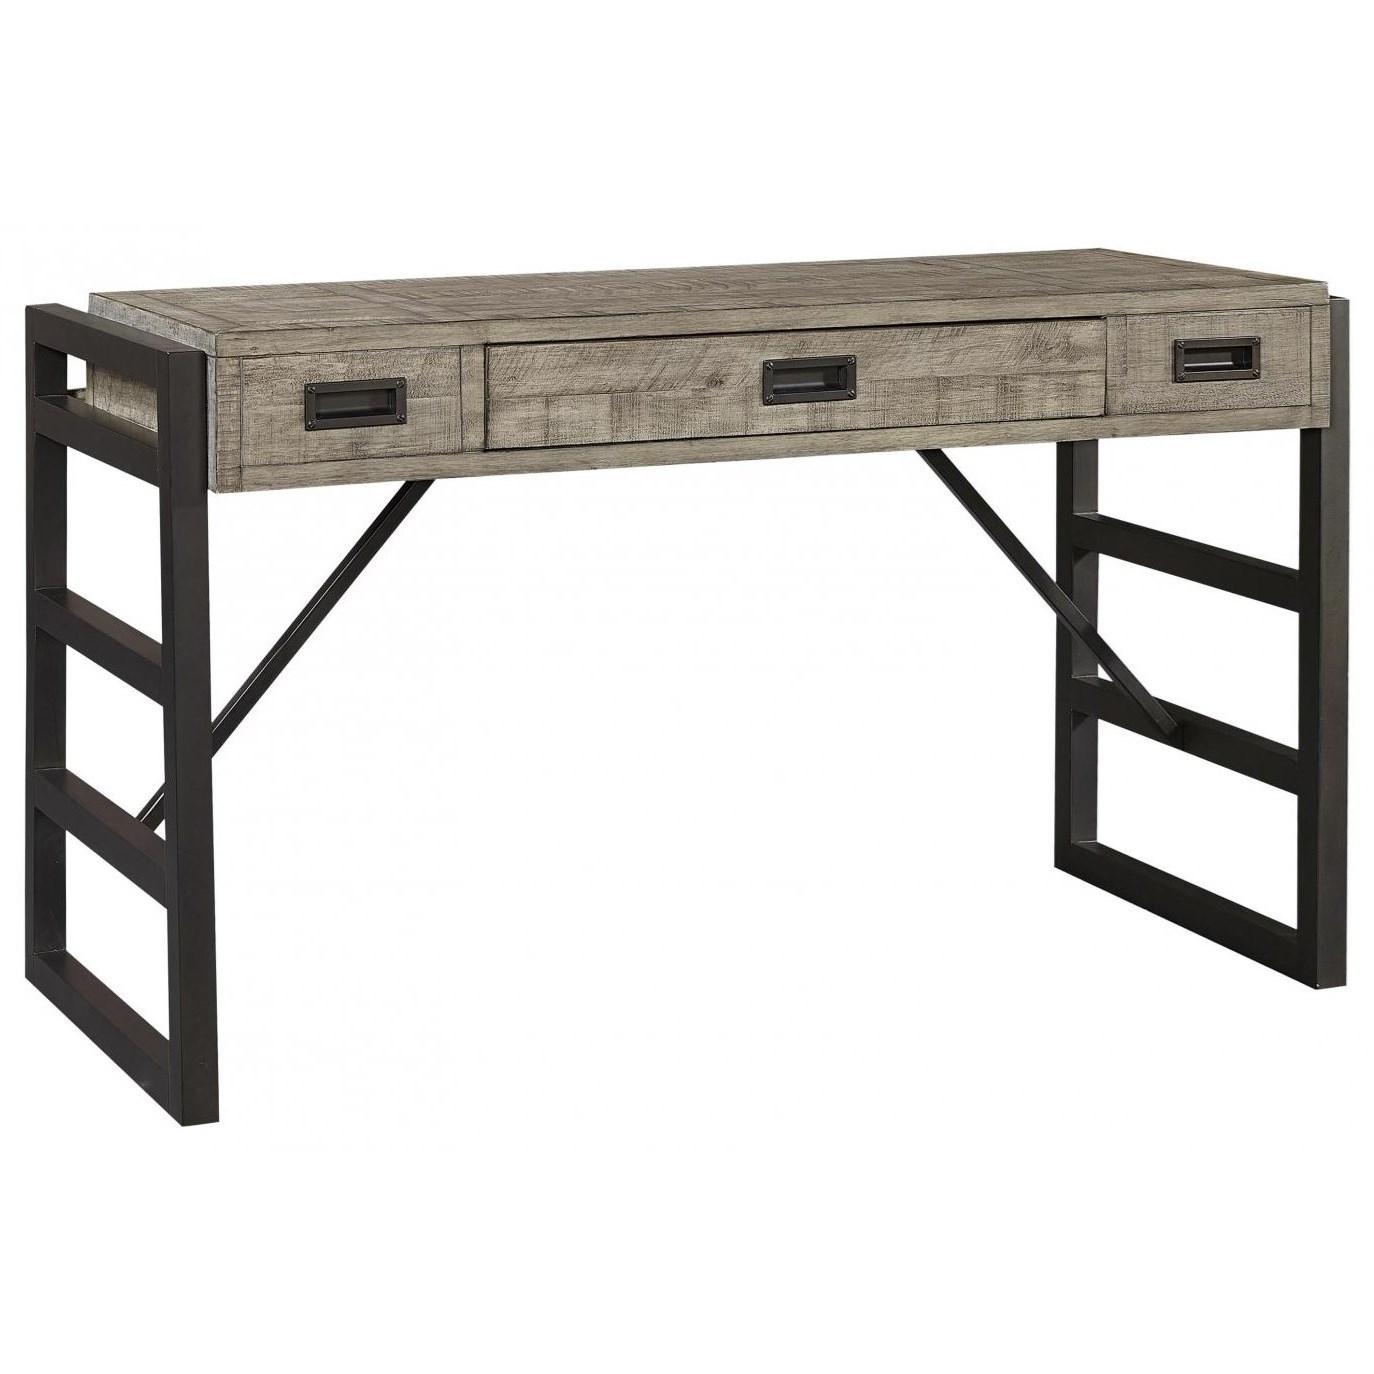 Grayson Liv360 Sofa/Writing Table by Aspenhome at Stoney Creek Furniture